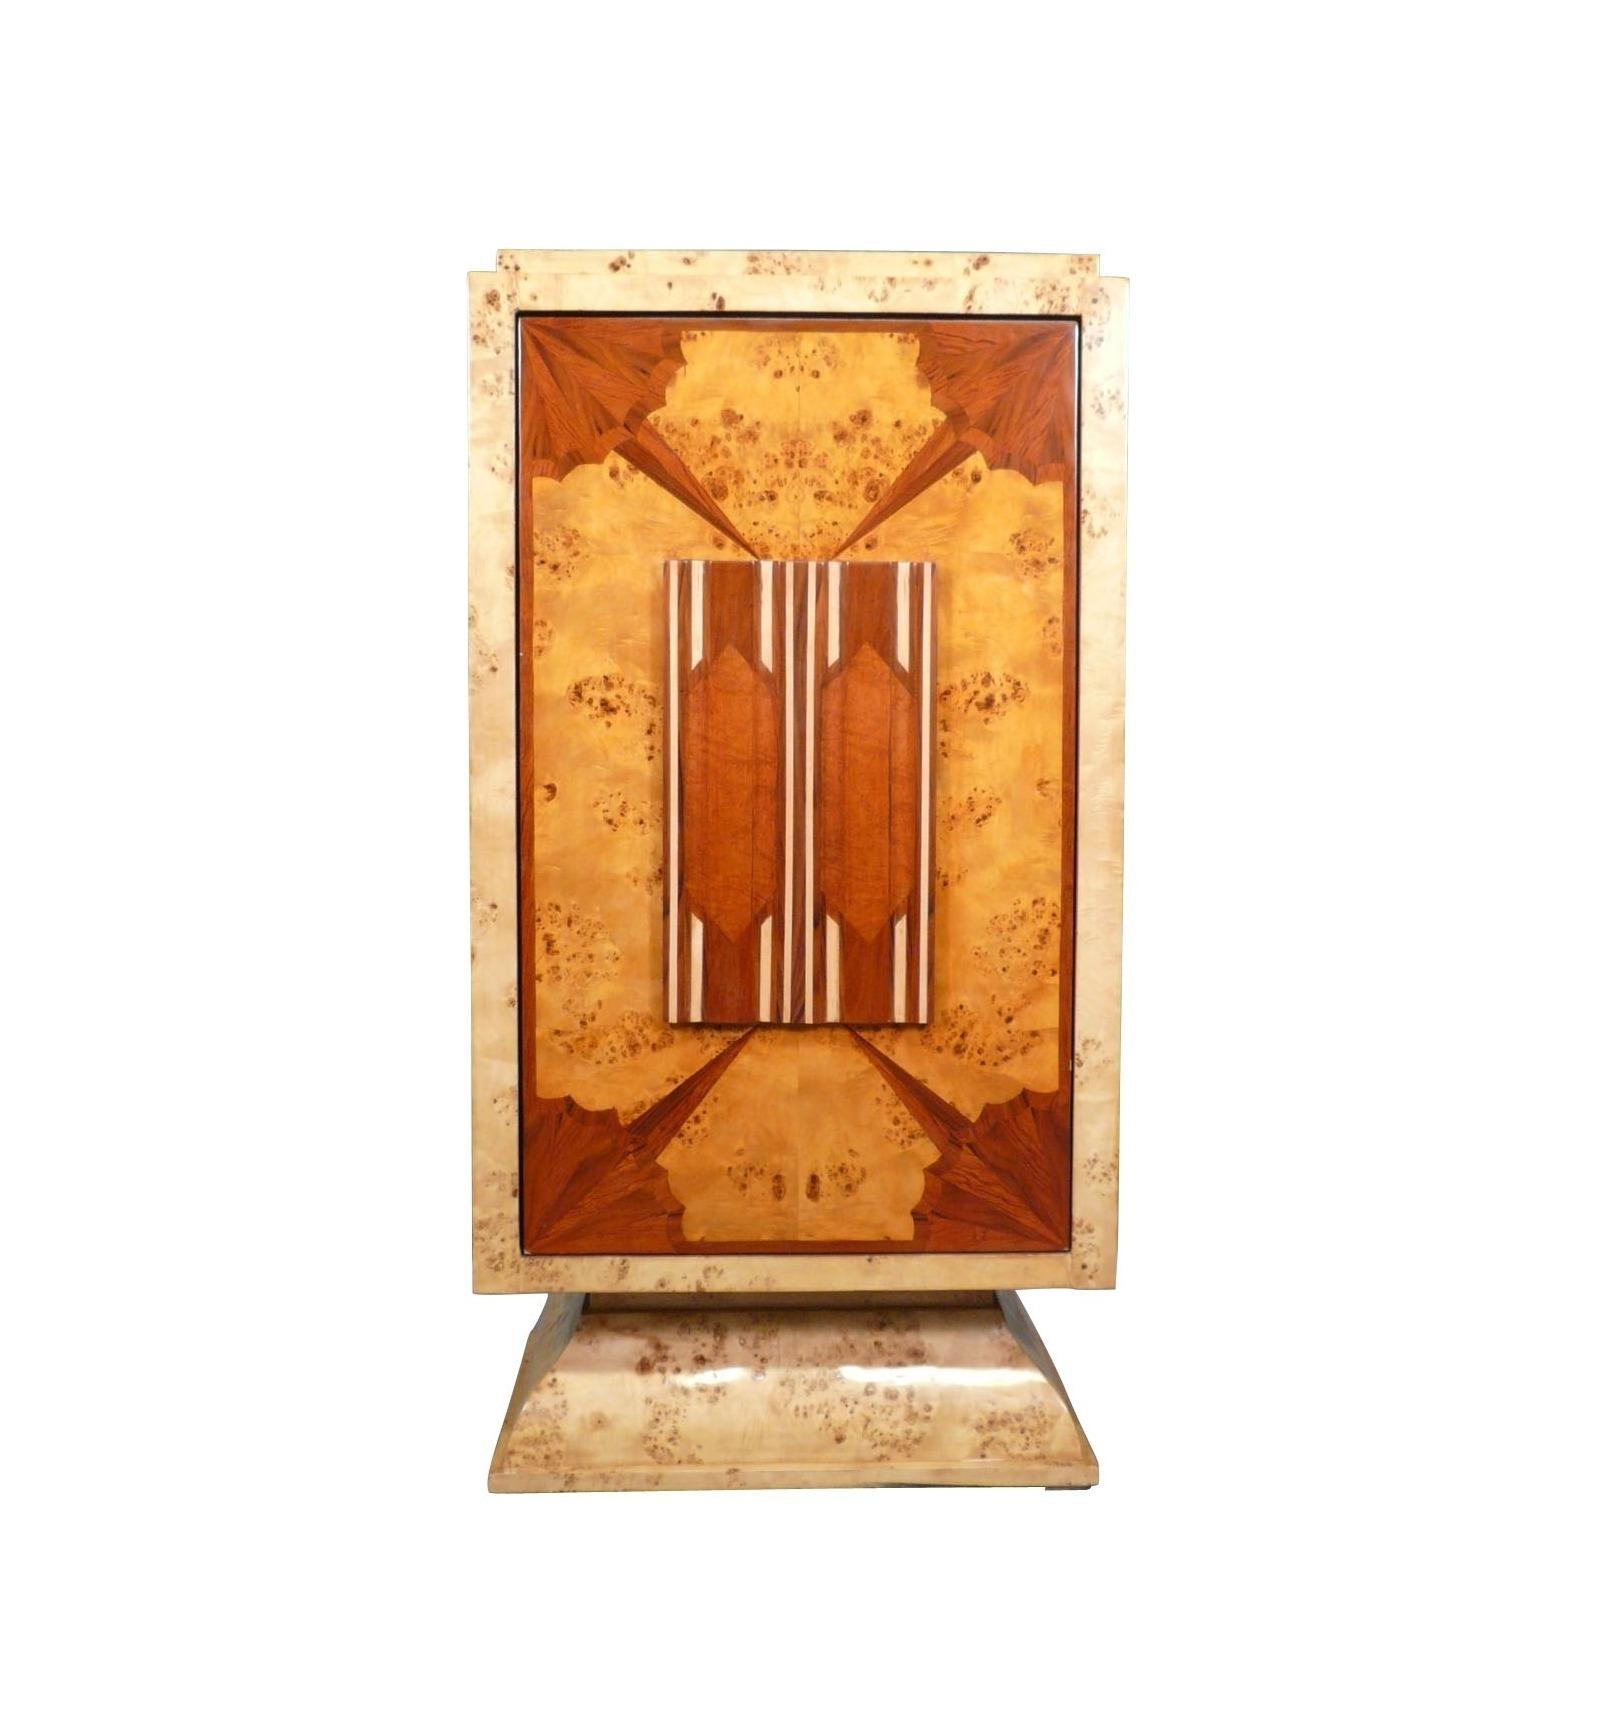 art deco mit schwenkbaren t r bar art deco m bel. Black Bedroom Furniture Sets. Home Design Ideas